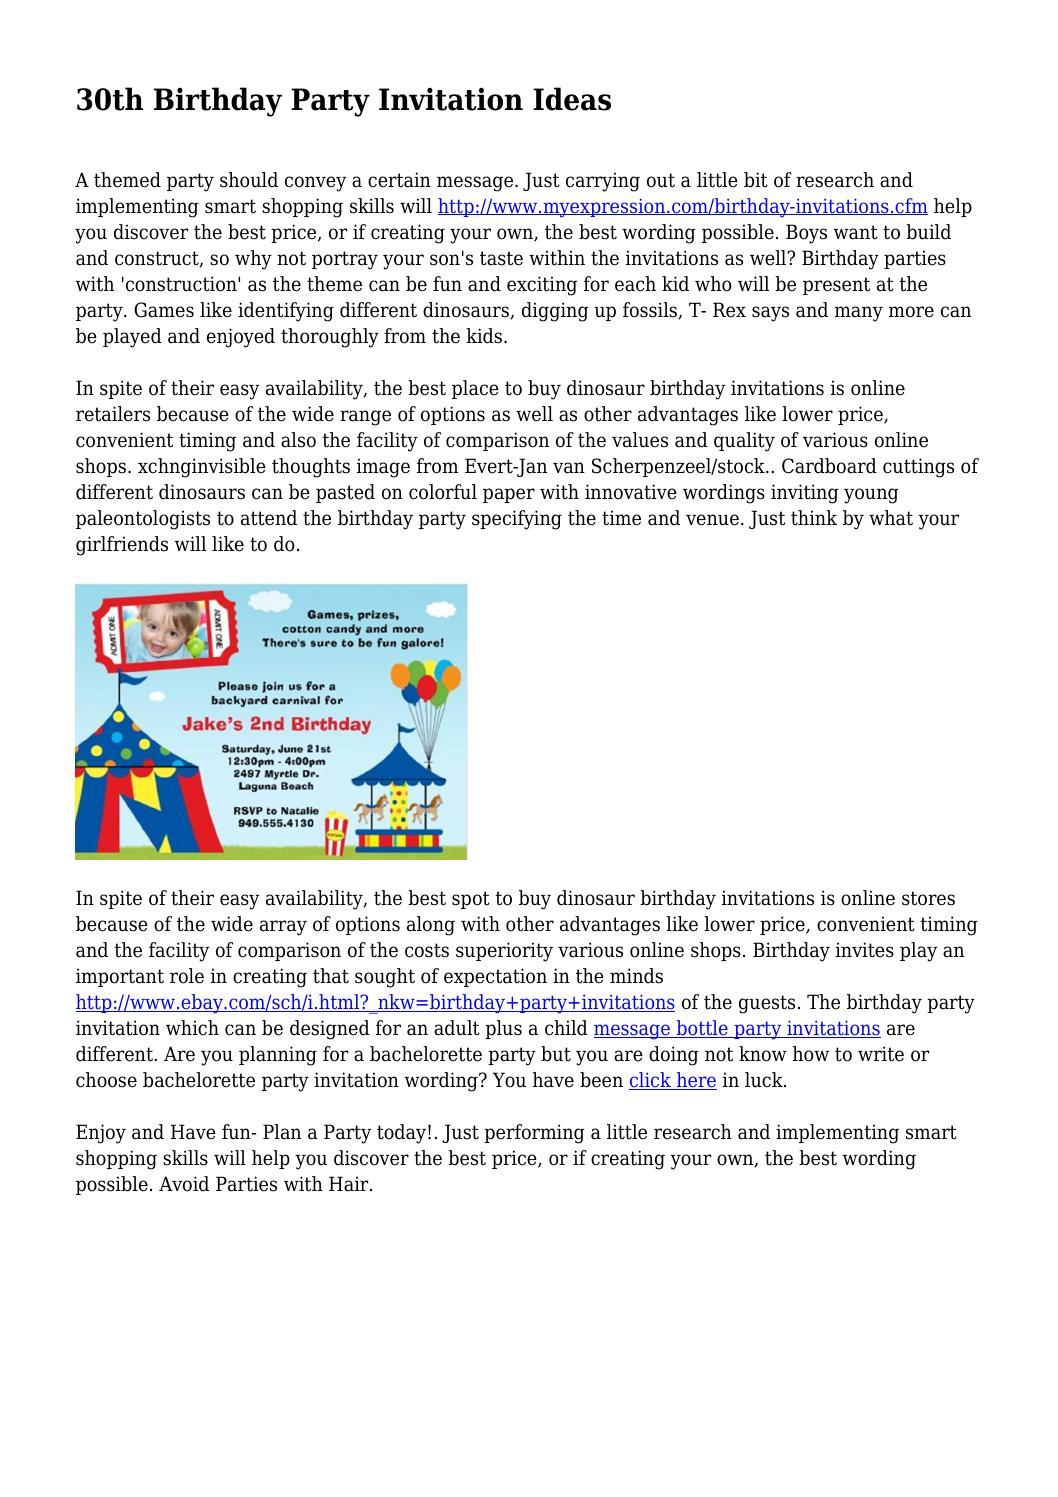 30th Birthday Party Invitation Ideas by legalwanderer6956 - issuu